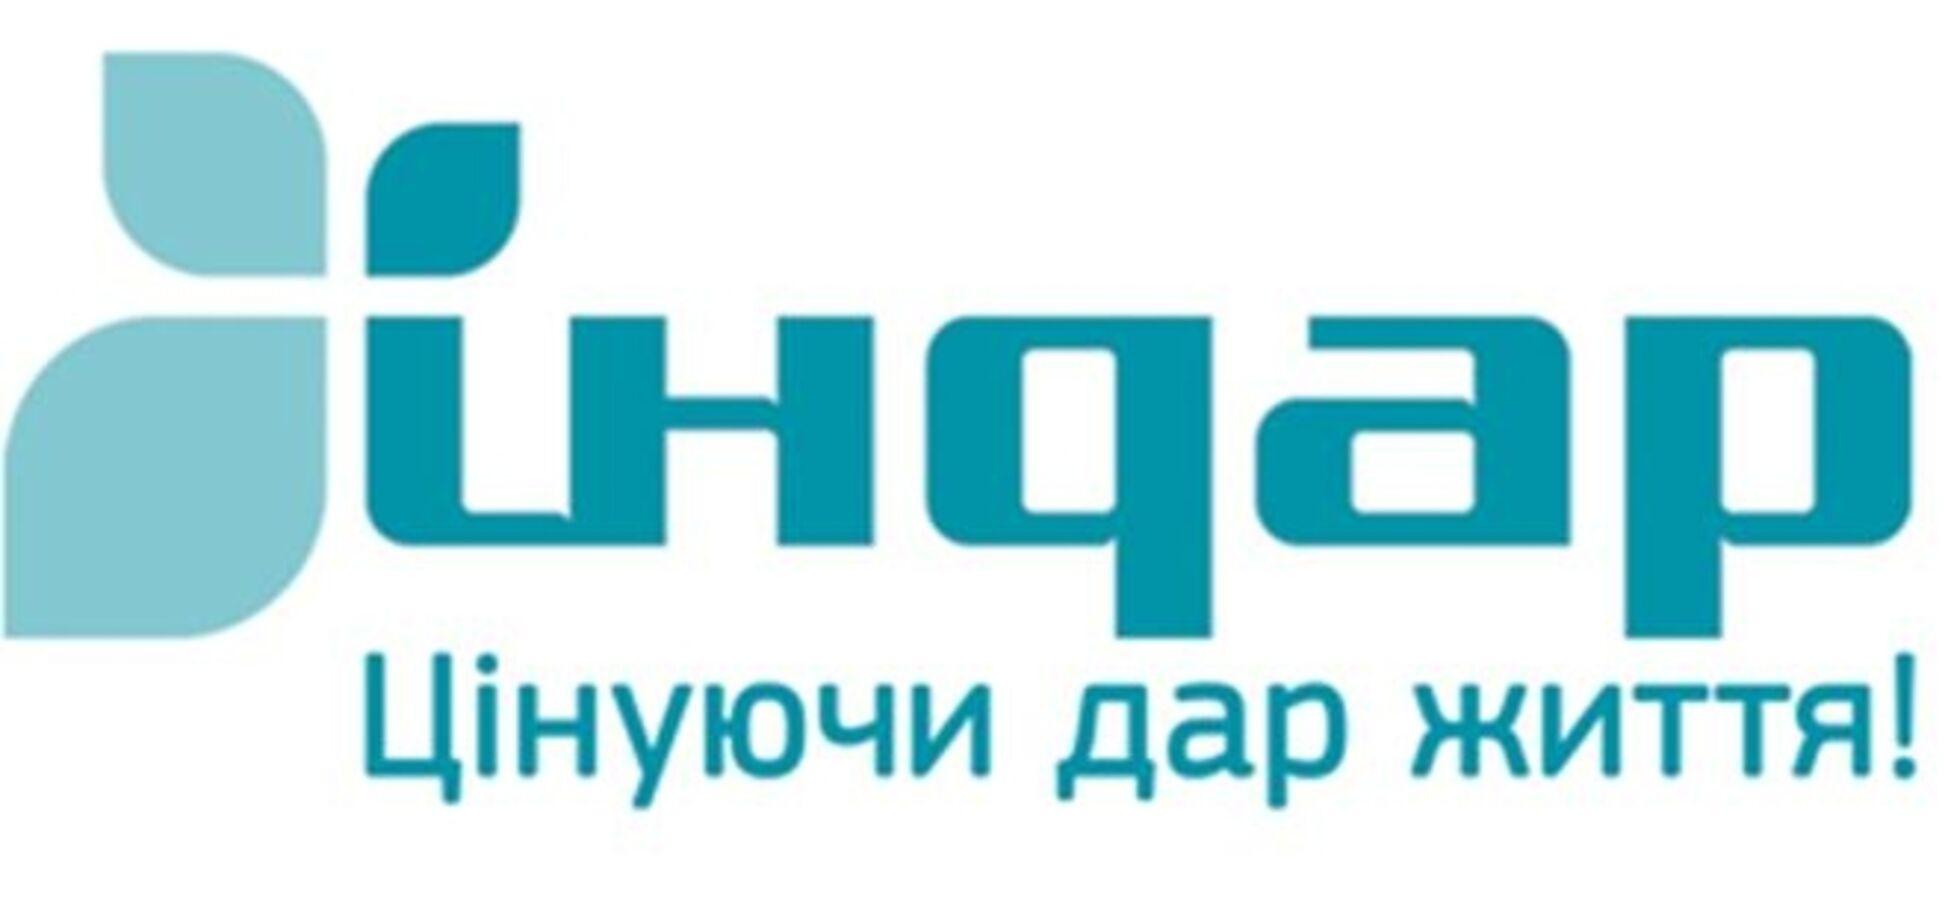 Комиссию Минздрава не пускают на территорию завода 'Индар'